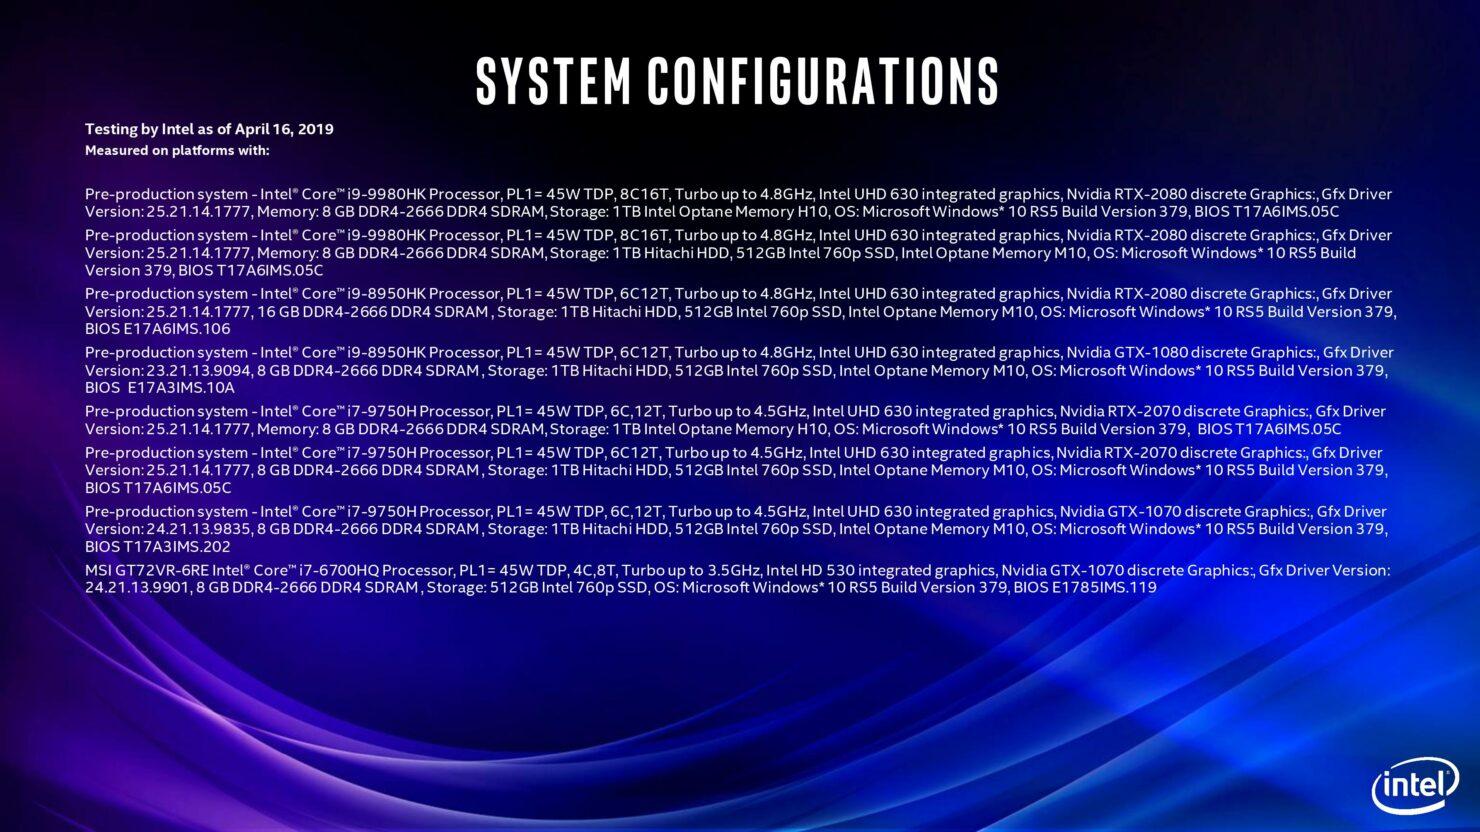 9th-gen-intel-core-mobile-launch-presentation-under-nda-until-april-23-page-030